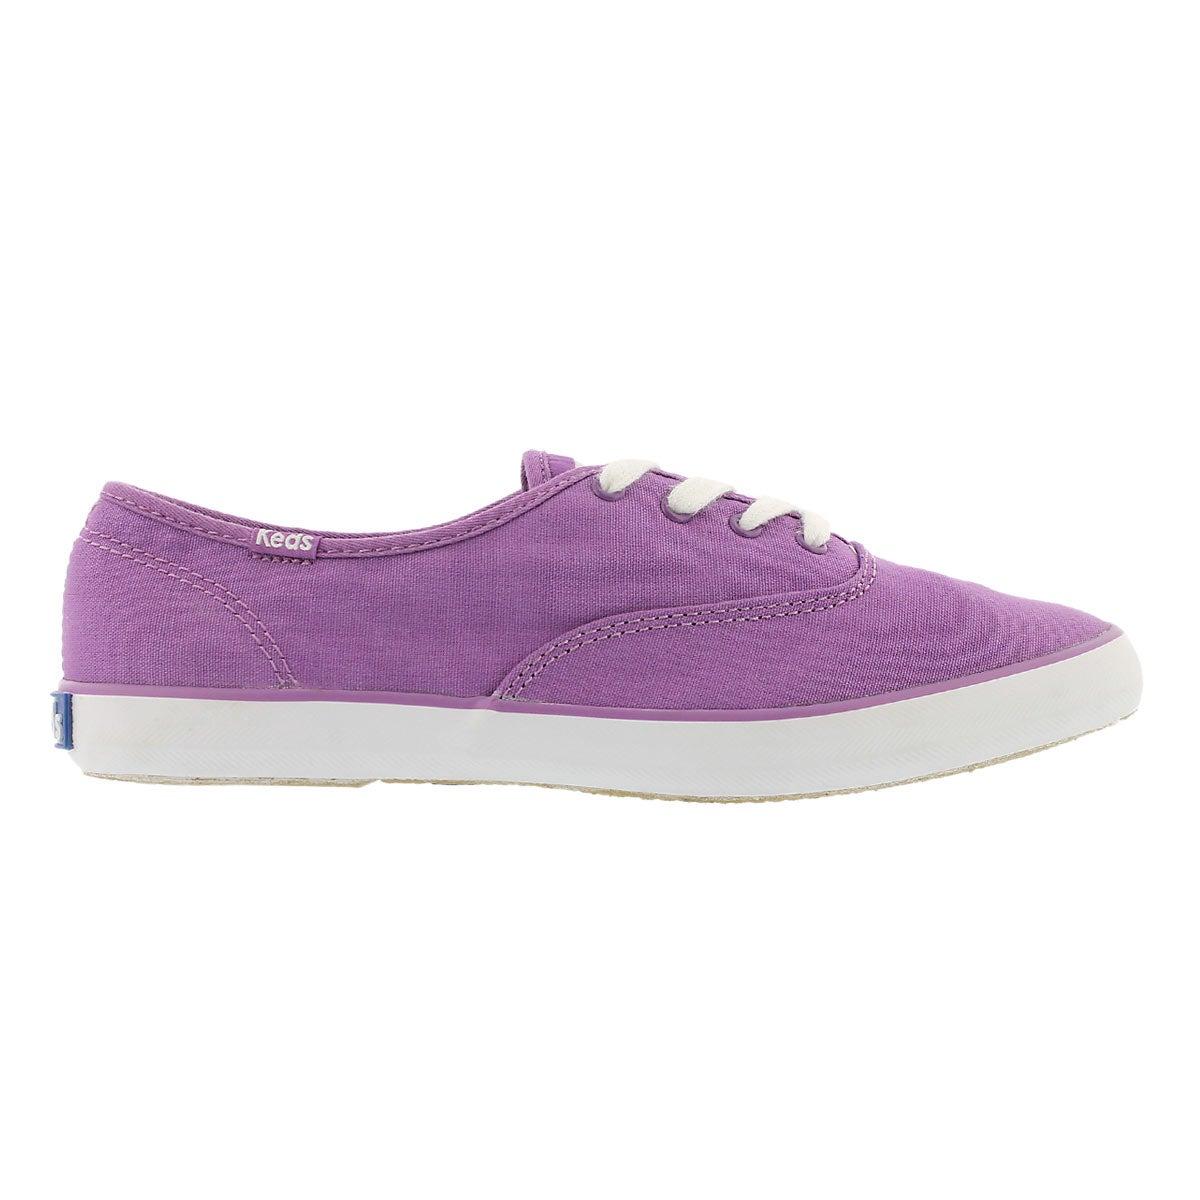 Lds Champion purple canvas sneaker